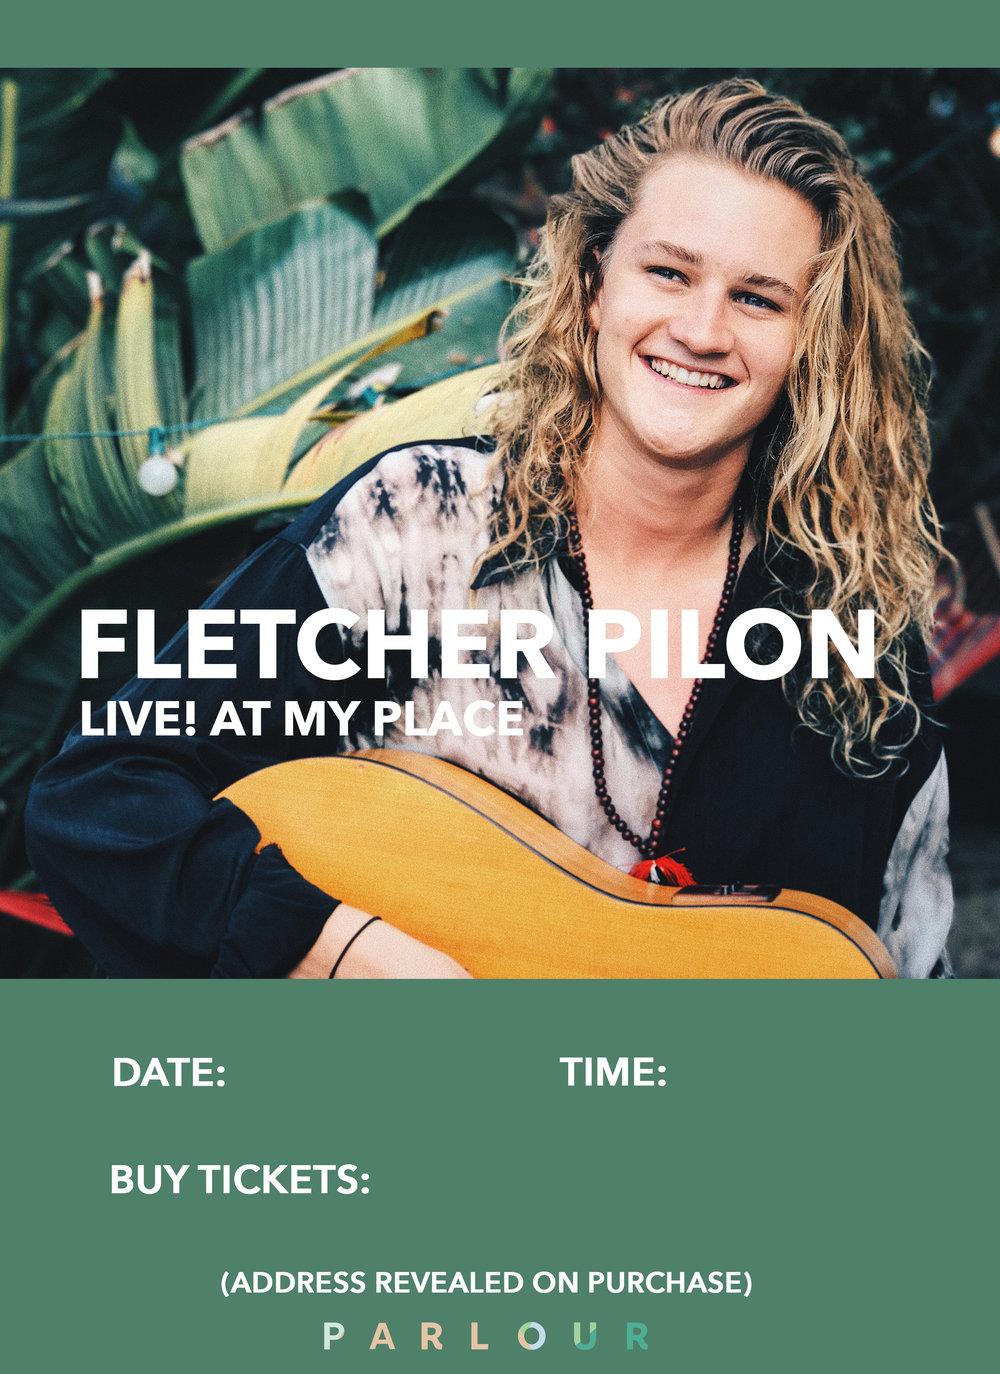 Fletcher Pilon Poster